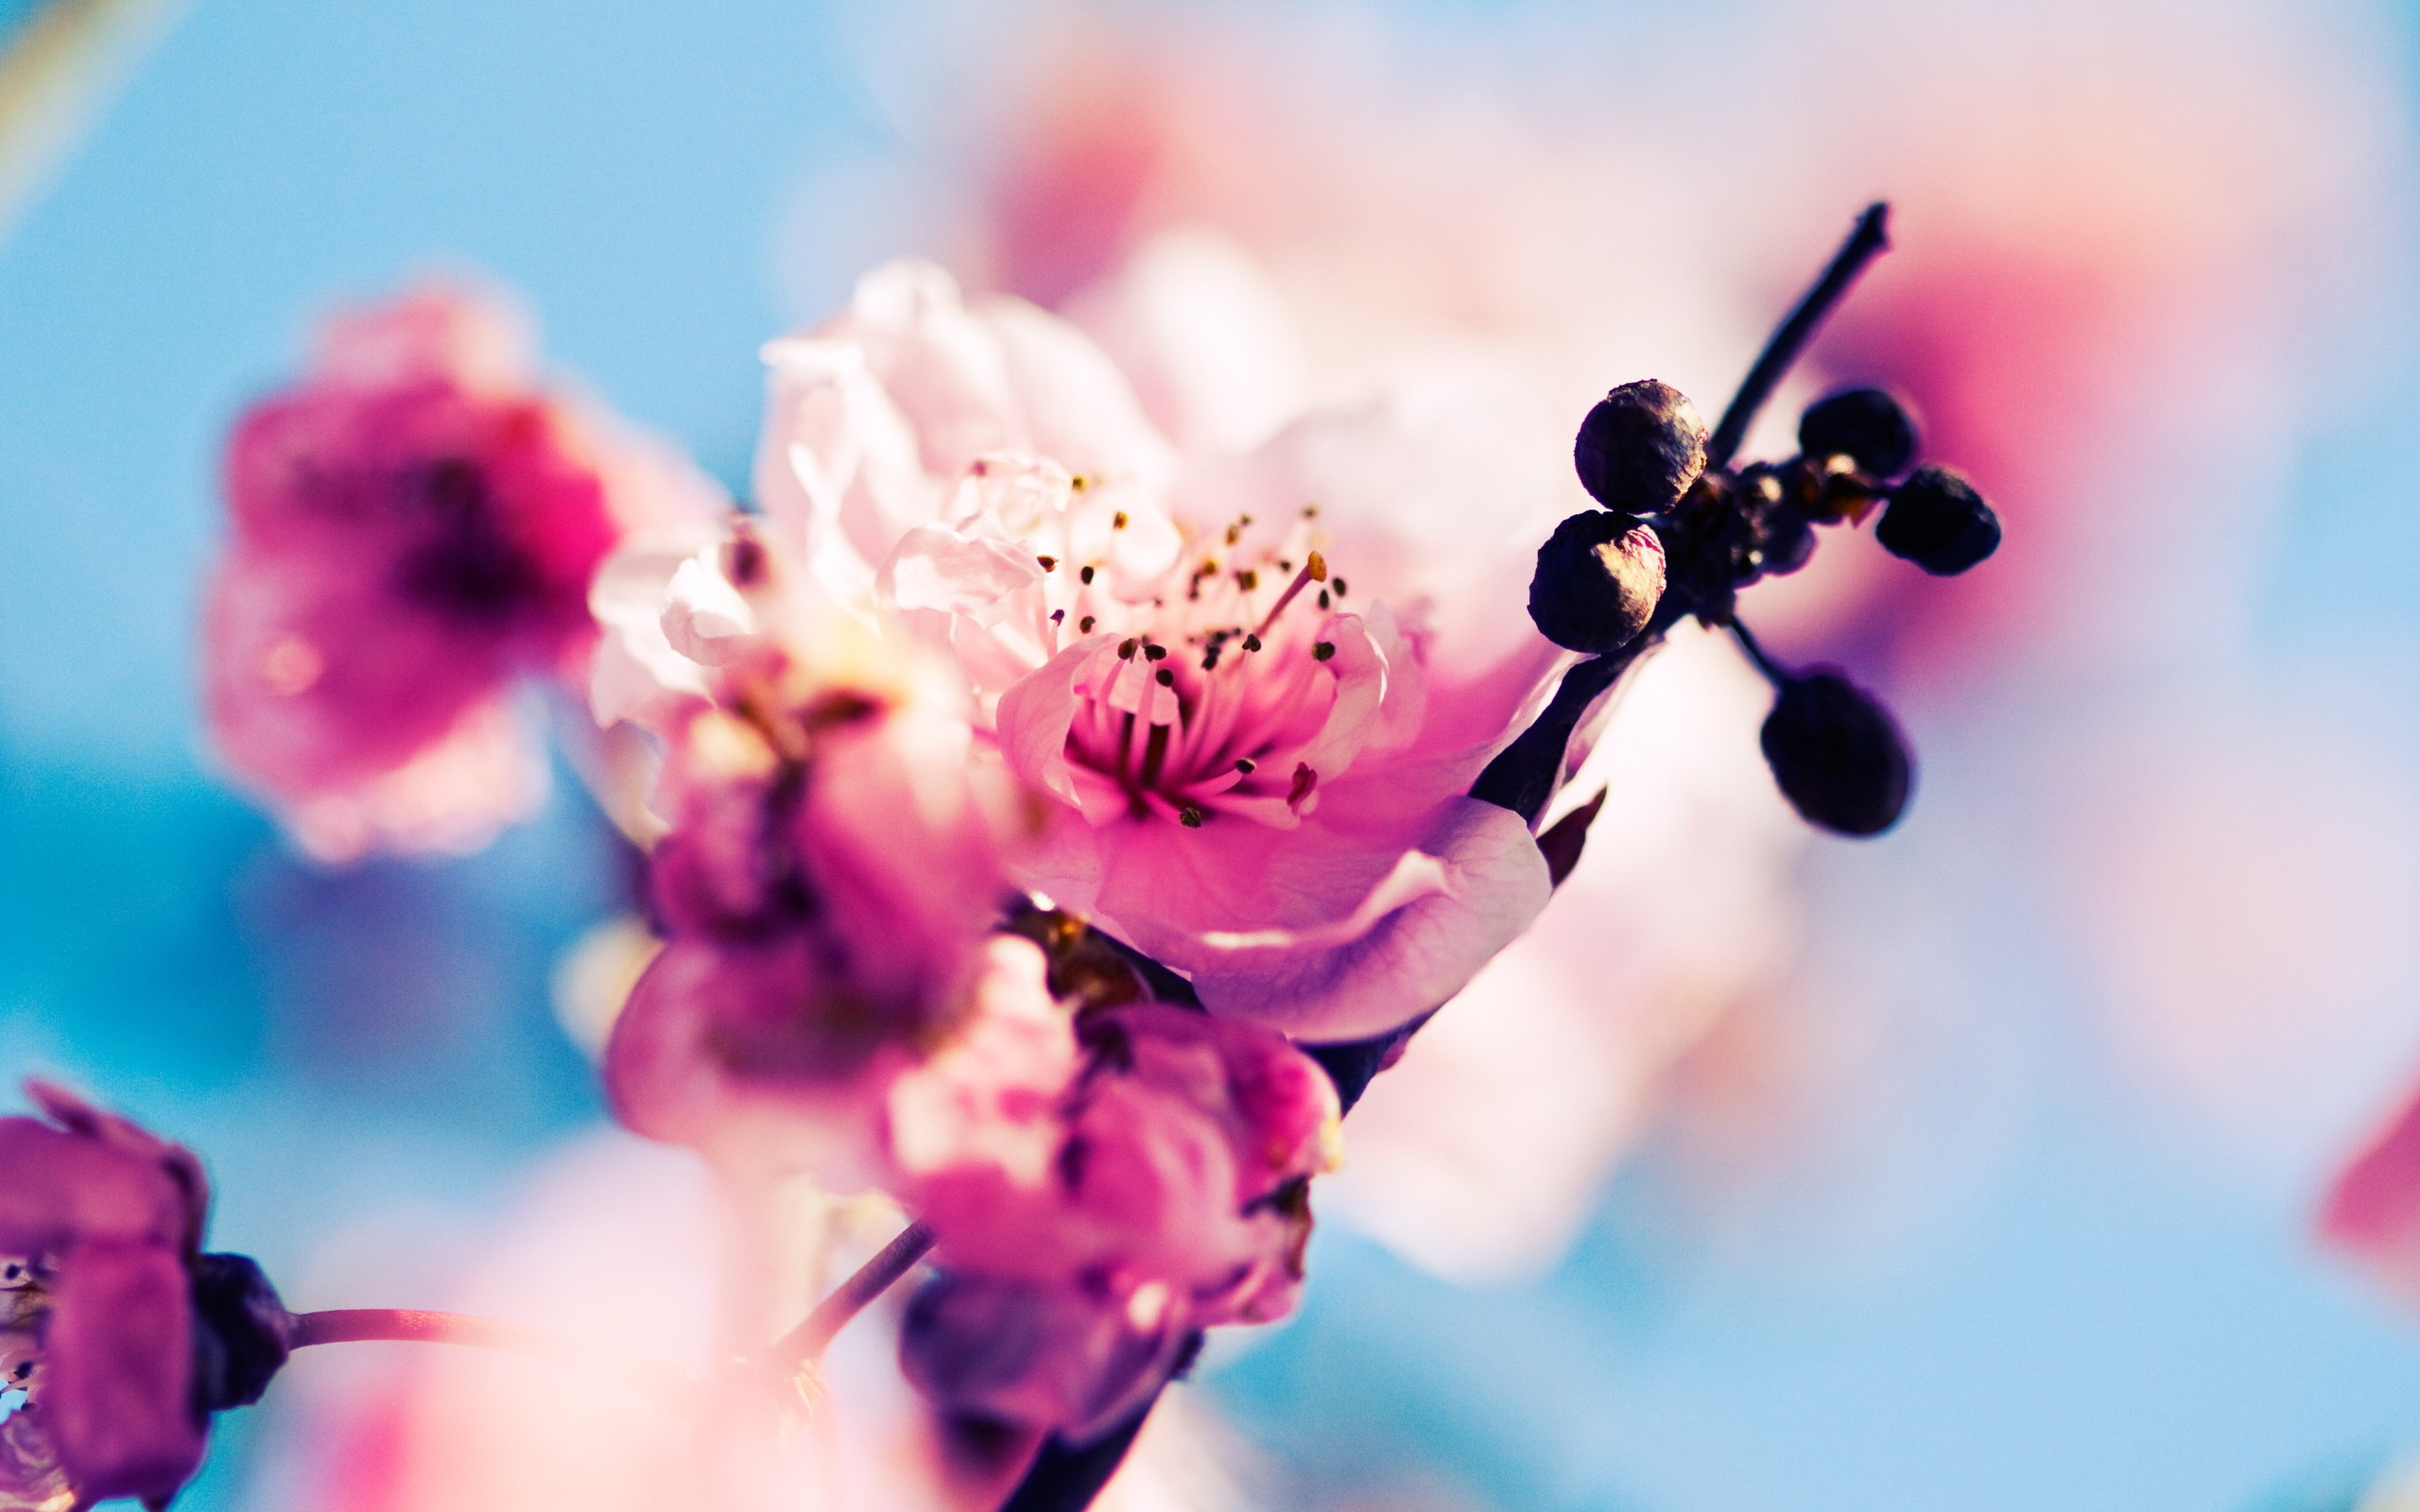 Sakura Wallpaper A Low Angle Shot Of White Cherry Blossom